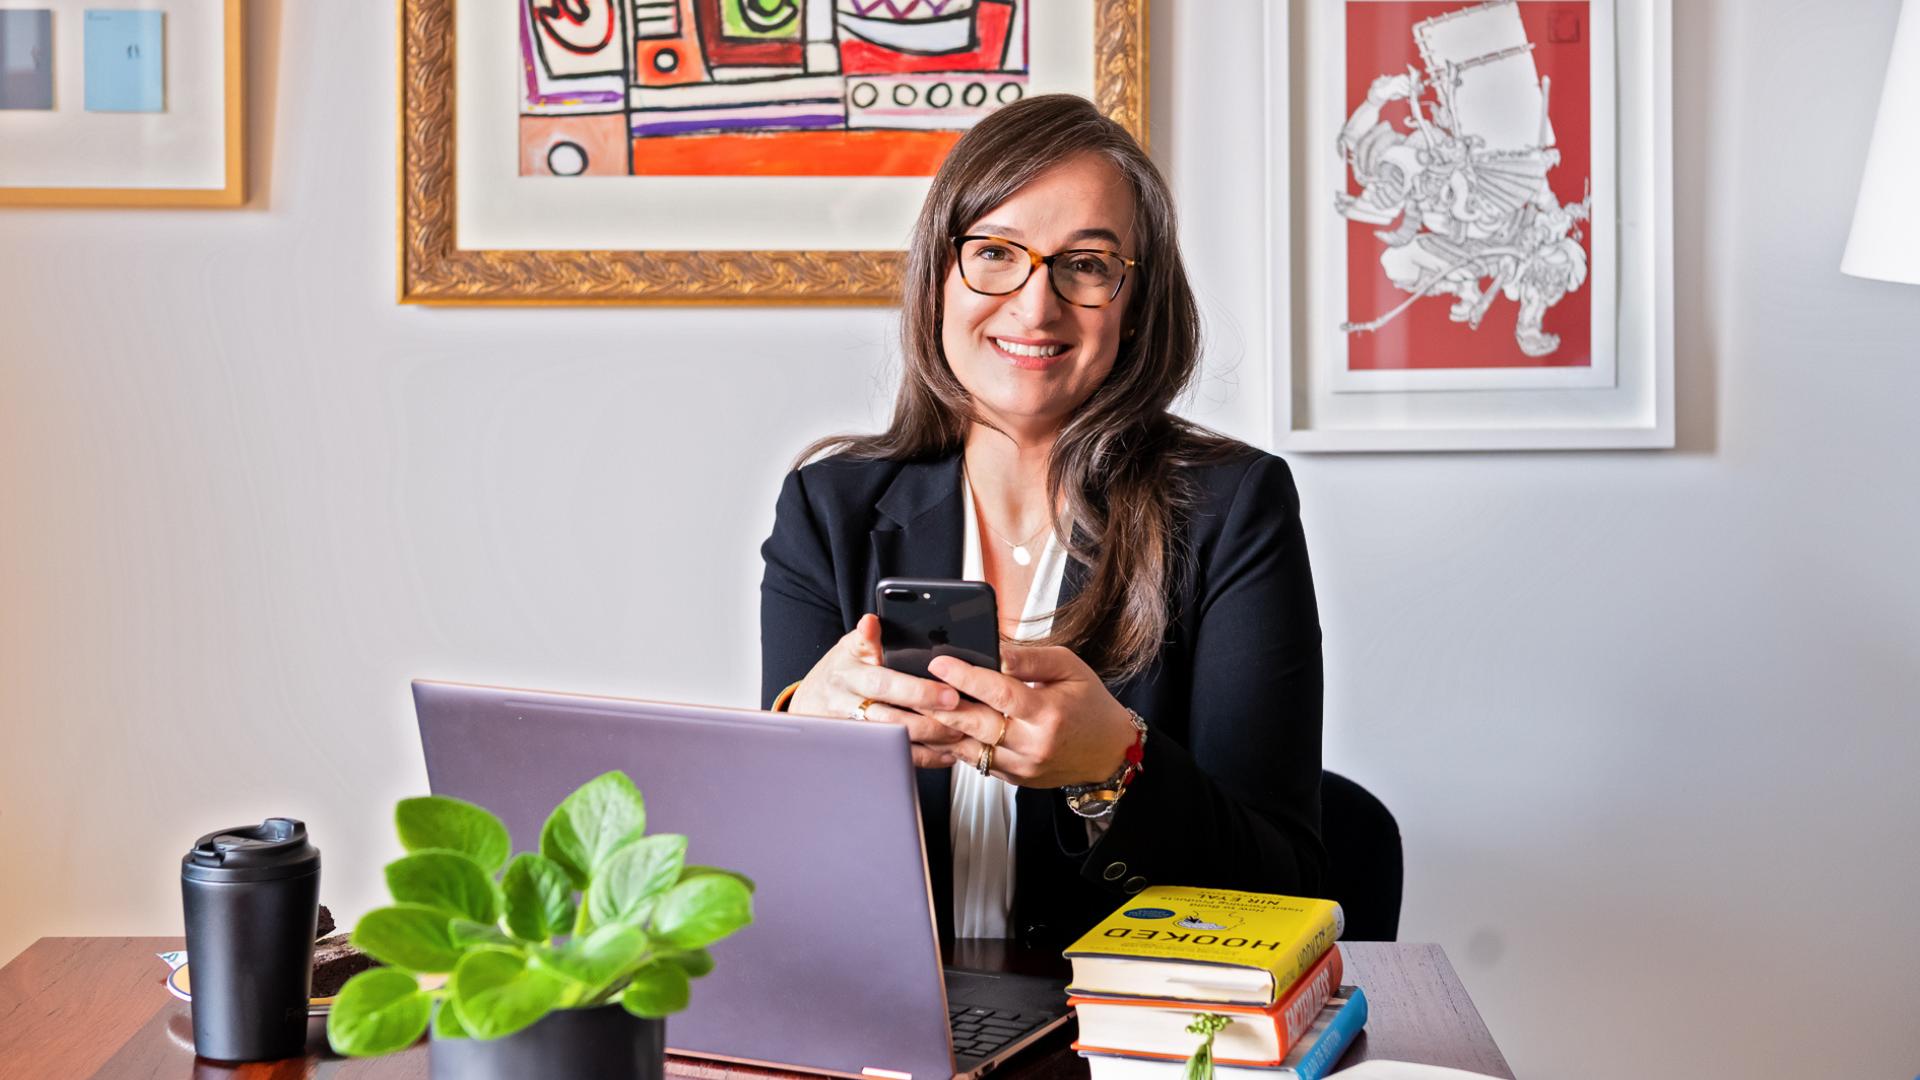 Job-hunting Expert and Career Coach Renata Bernarde